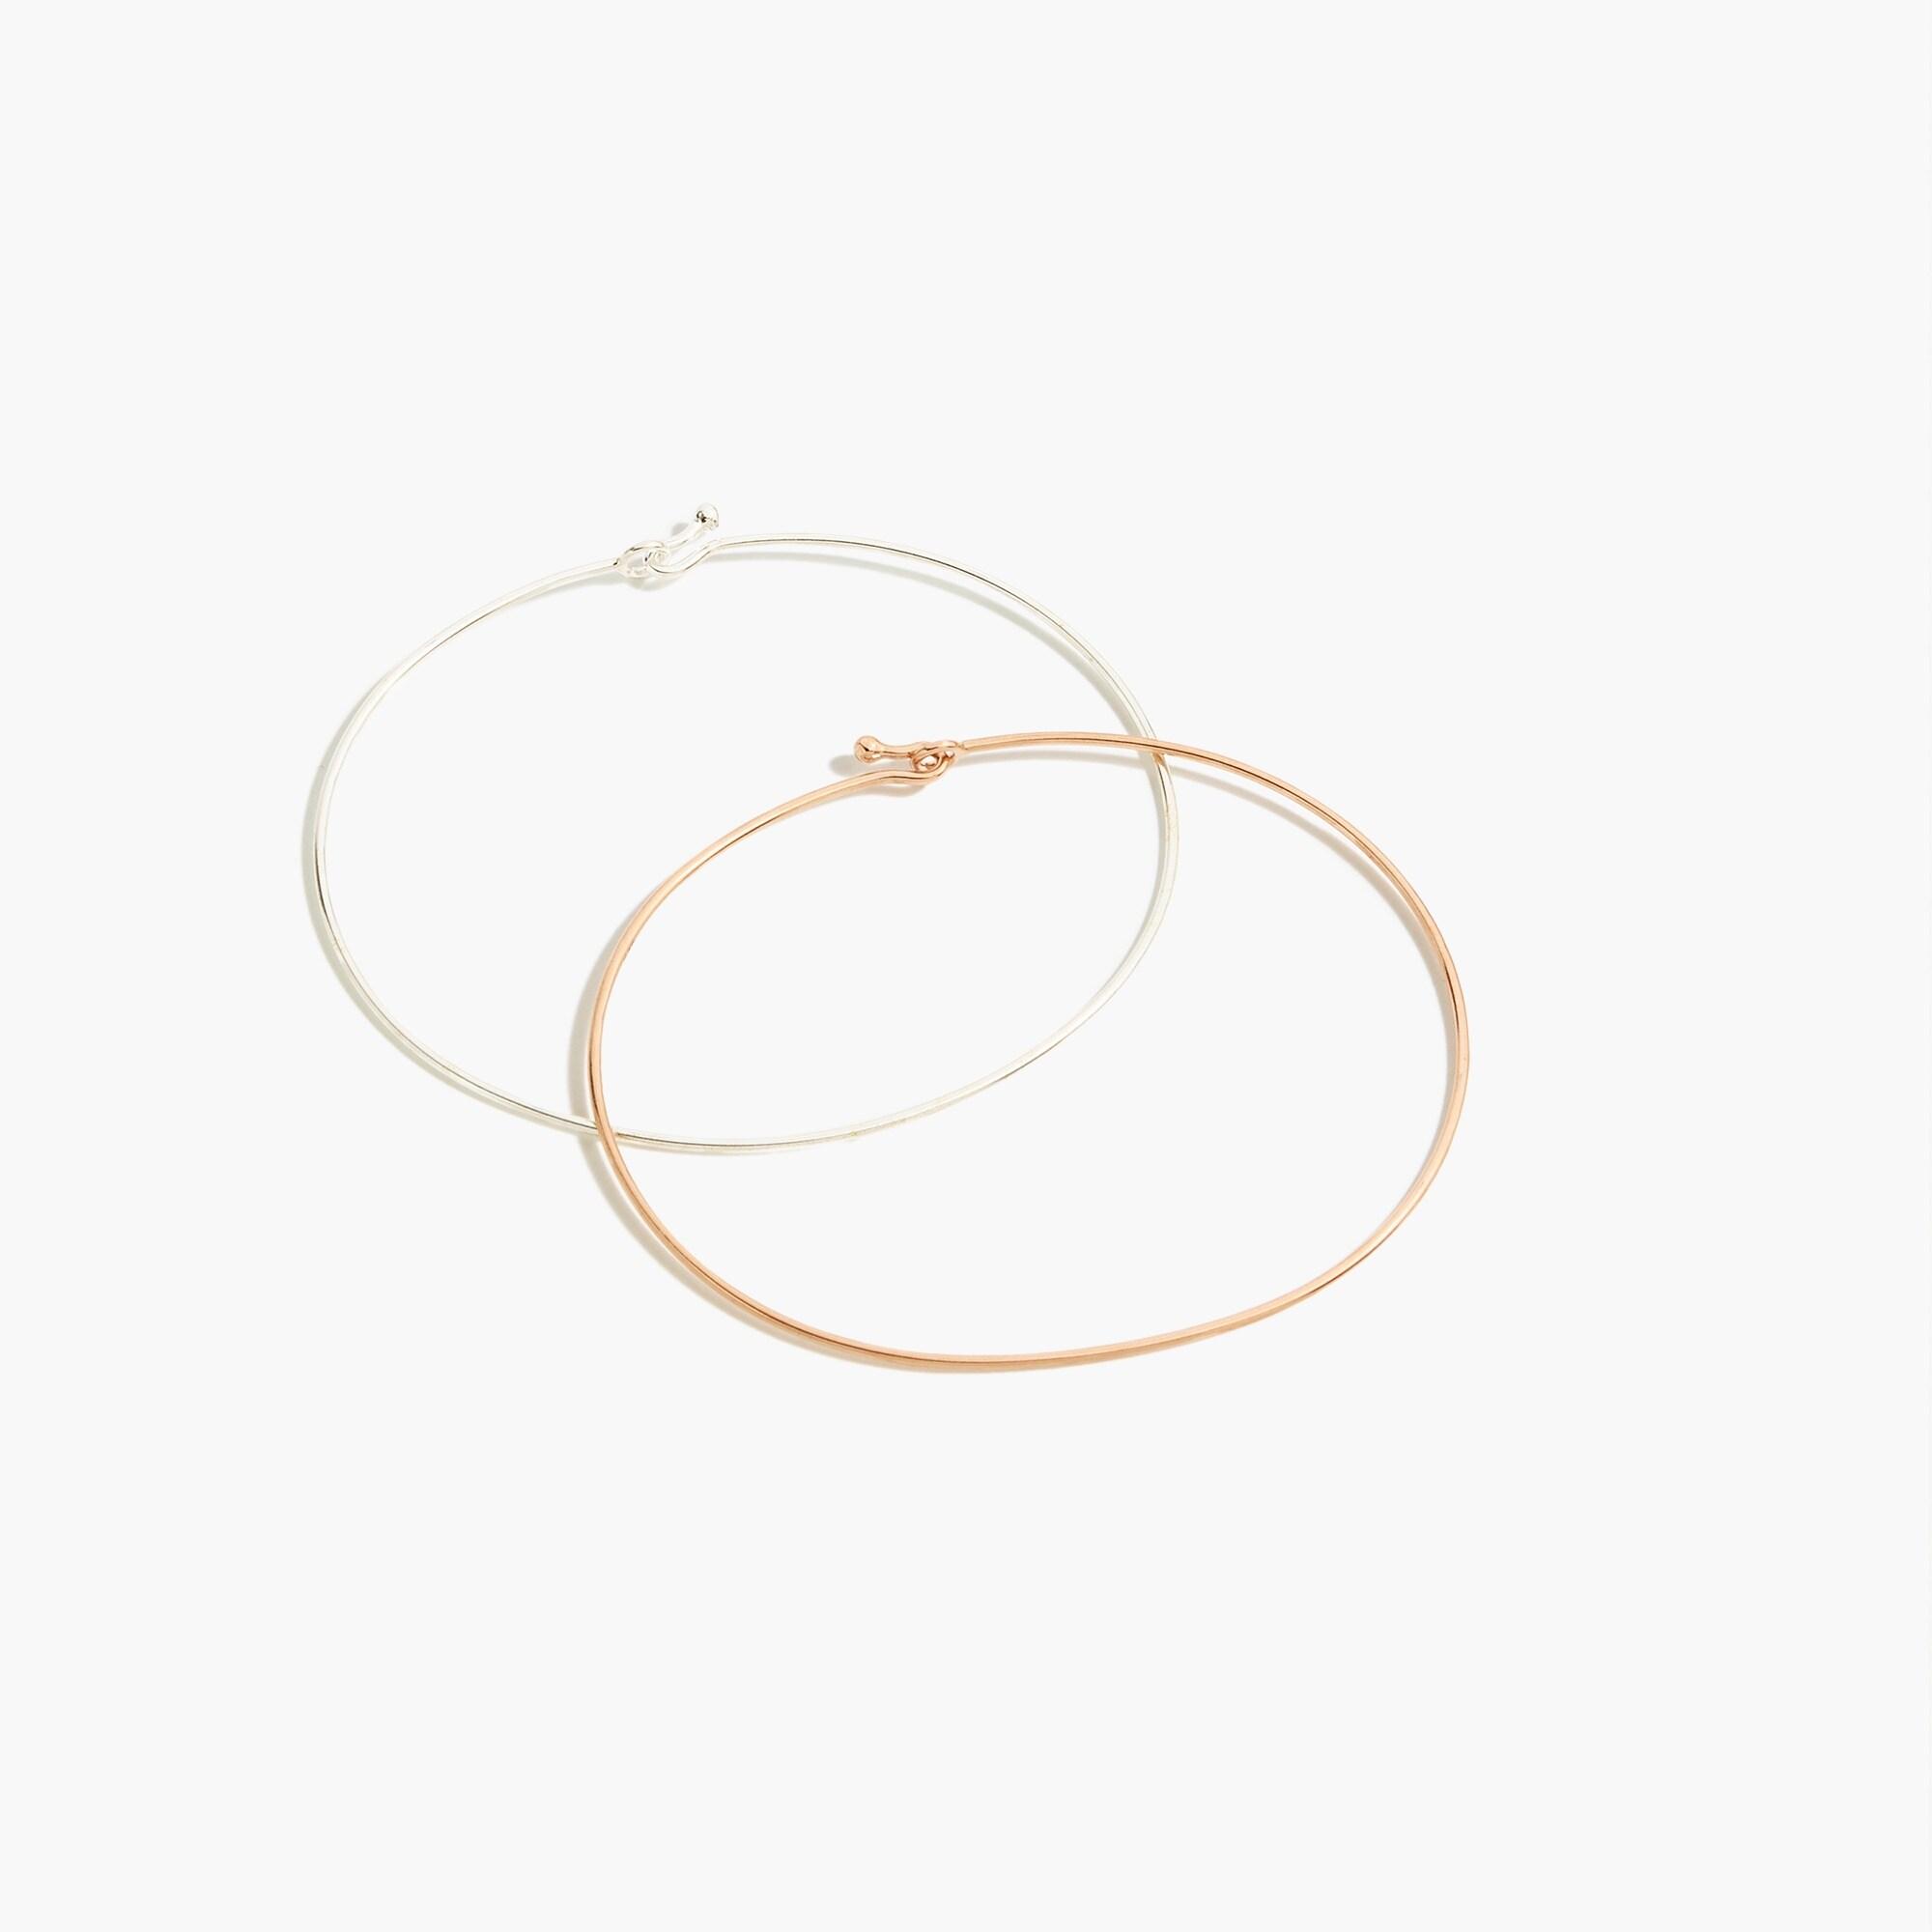 Demi-fine 14k gold-plated wire bracelets women new arrivals c